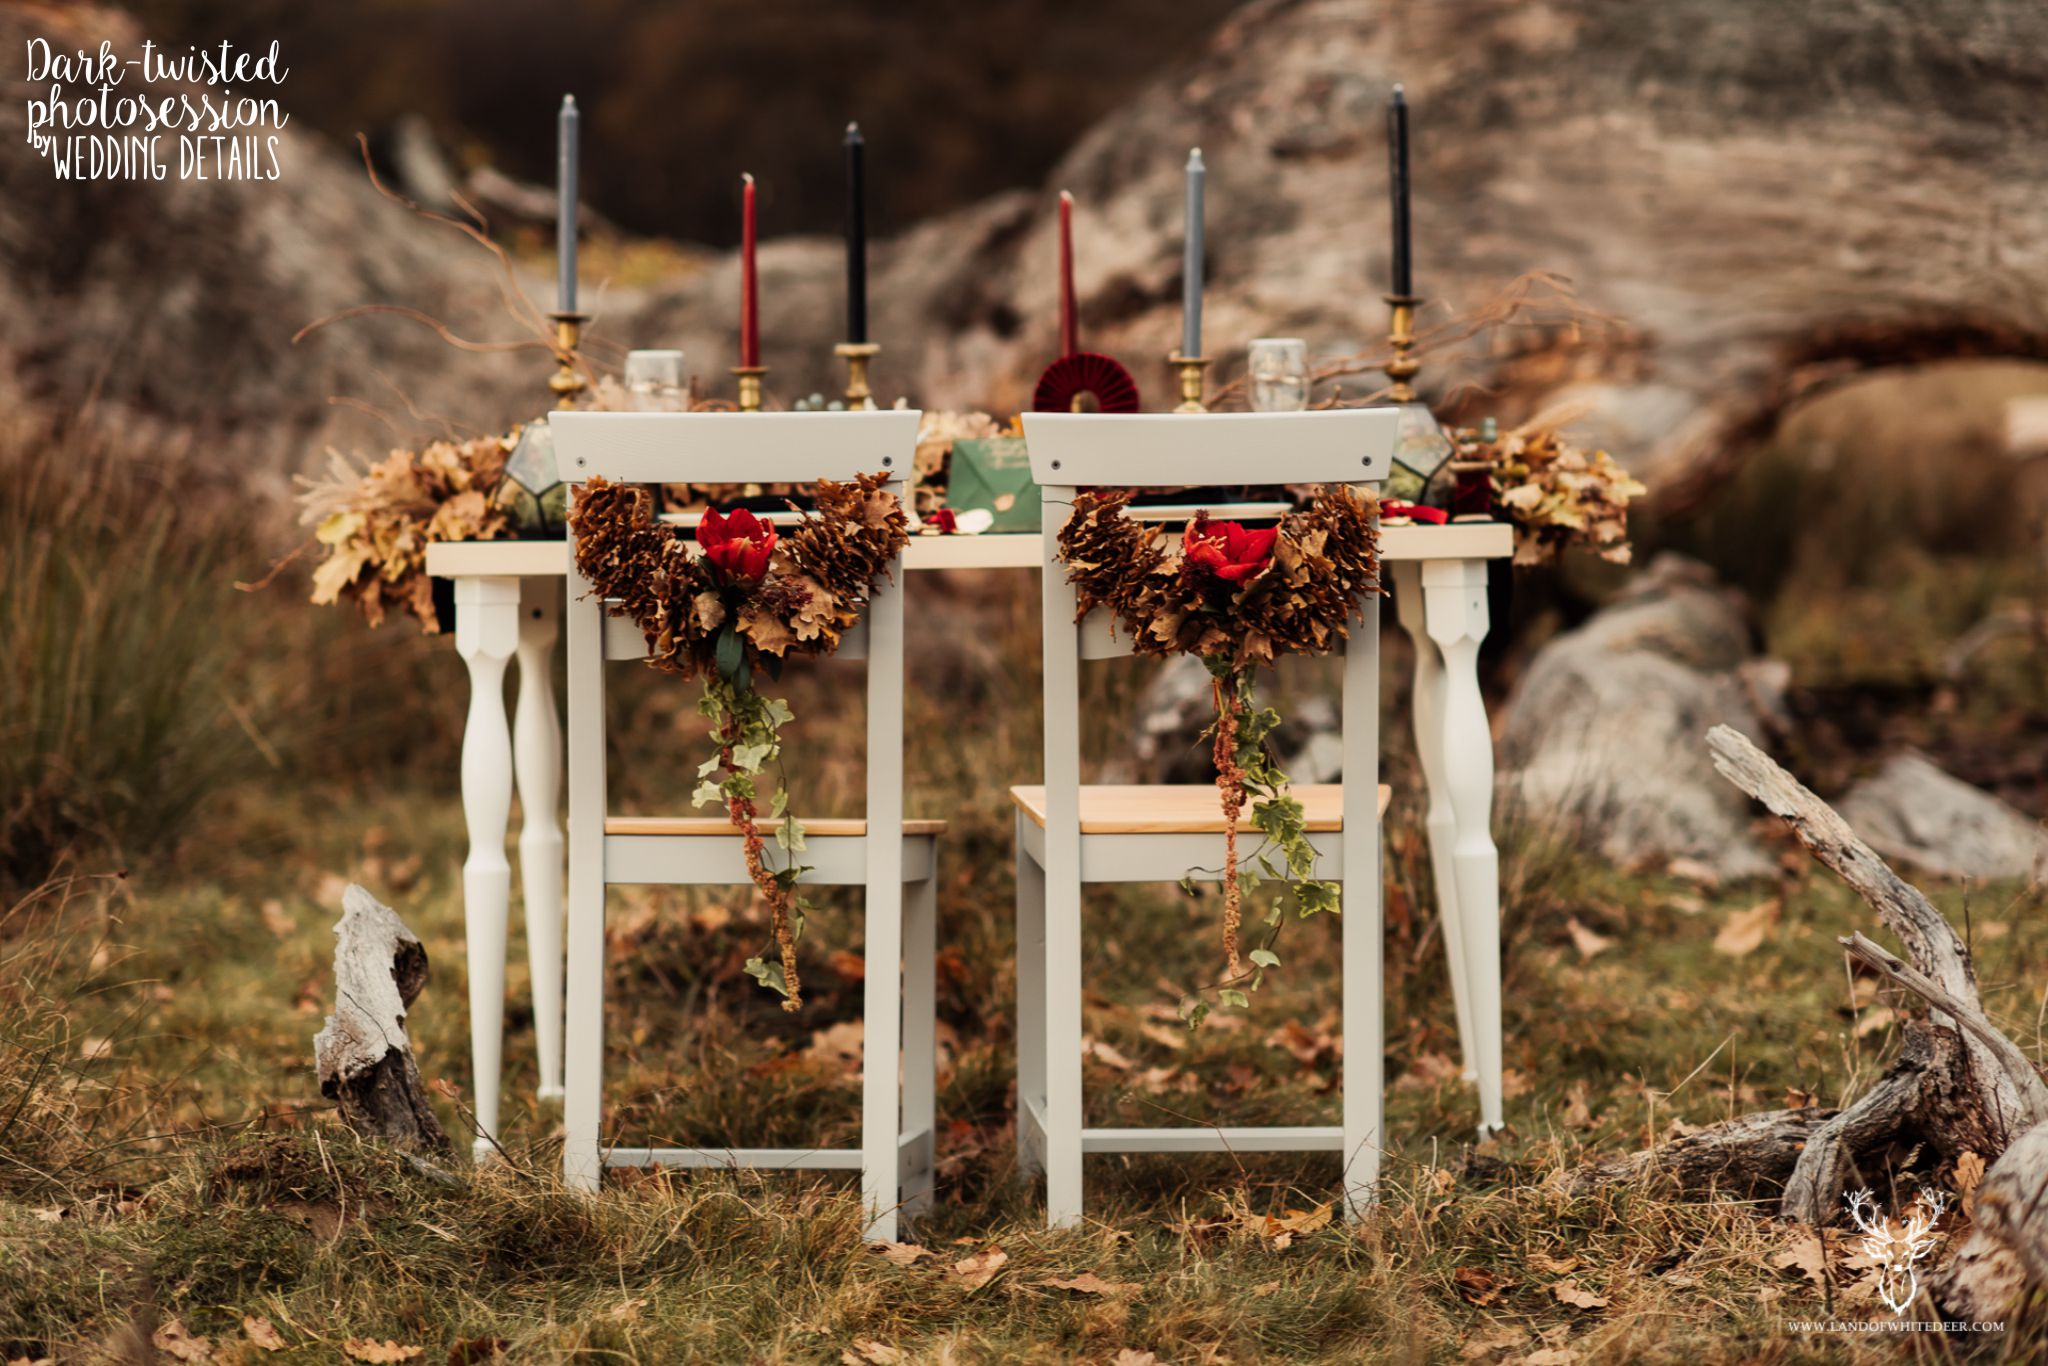 detaliile nuntii wedding details